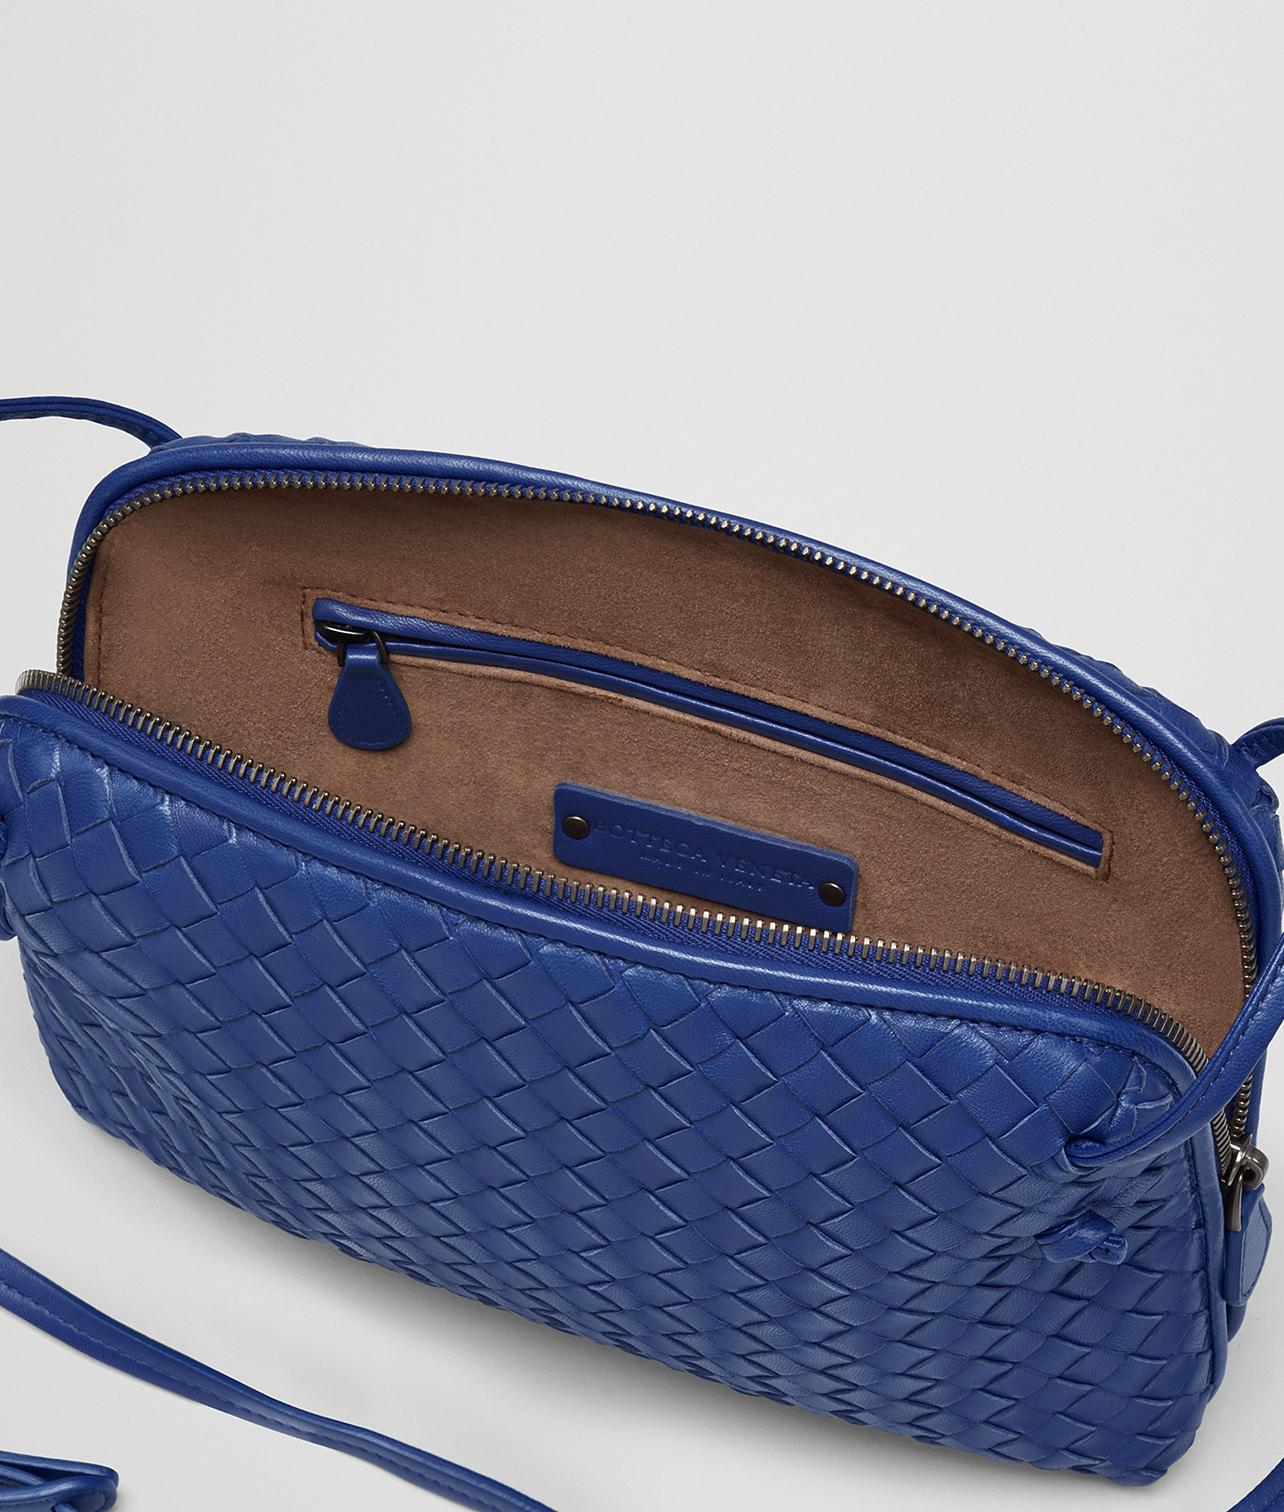 ae8f0af8883 Lyst - Bottega Veneta Cobalt Intrecciato Nappa Nodini Bag in Blue